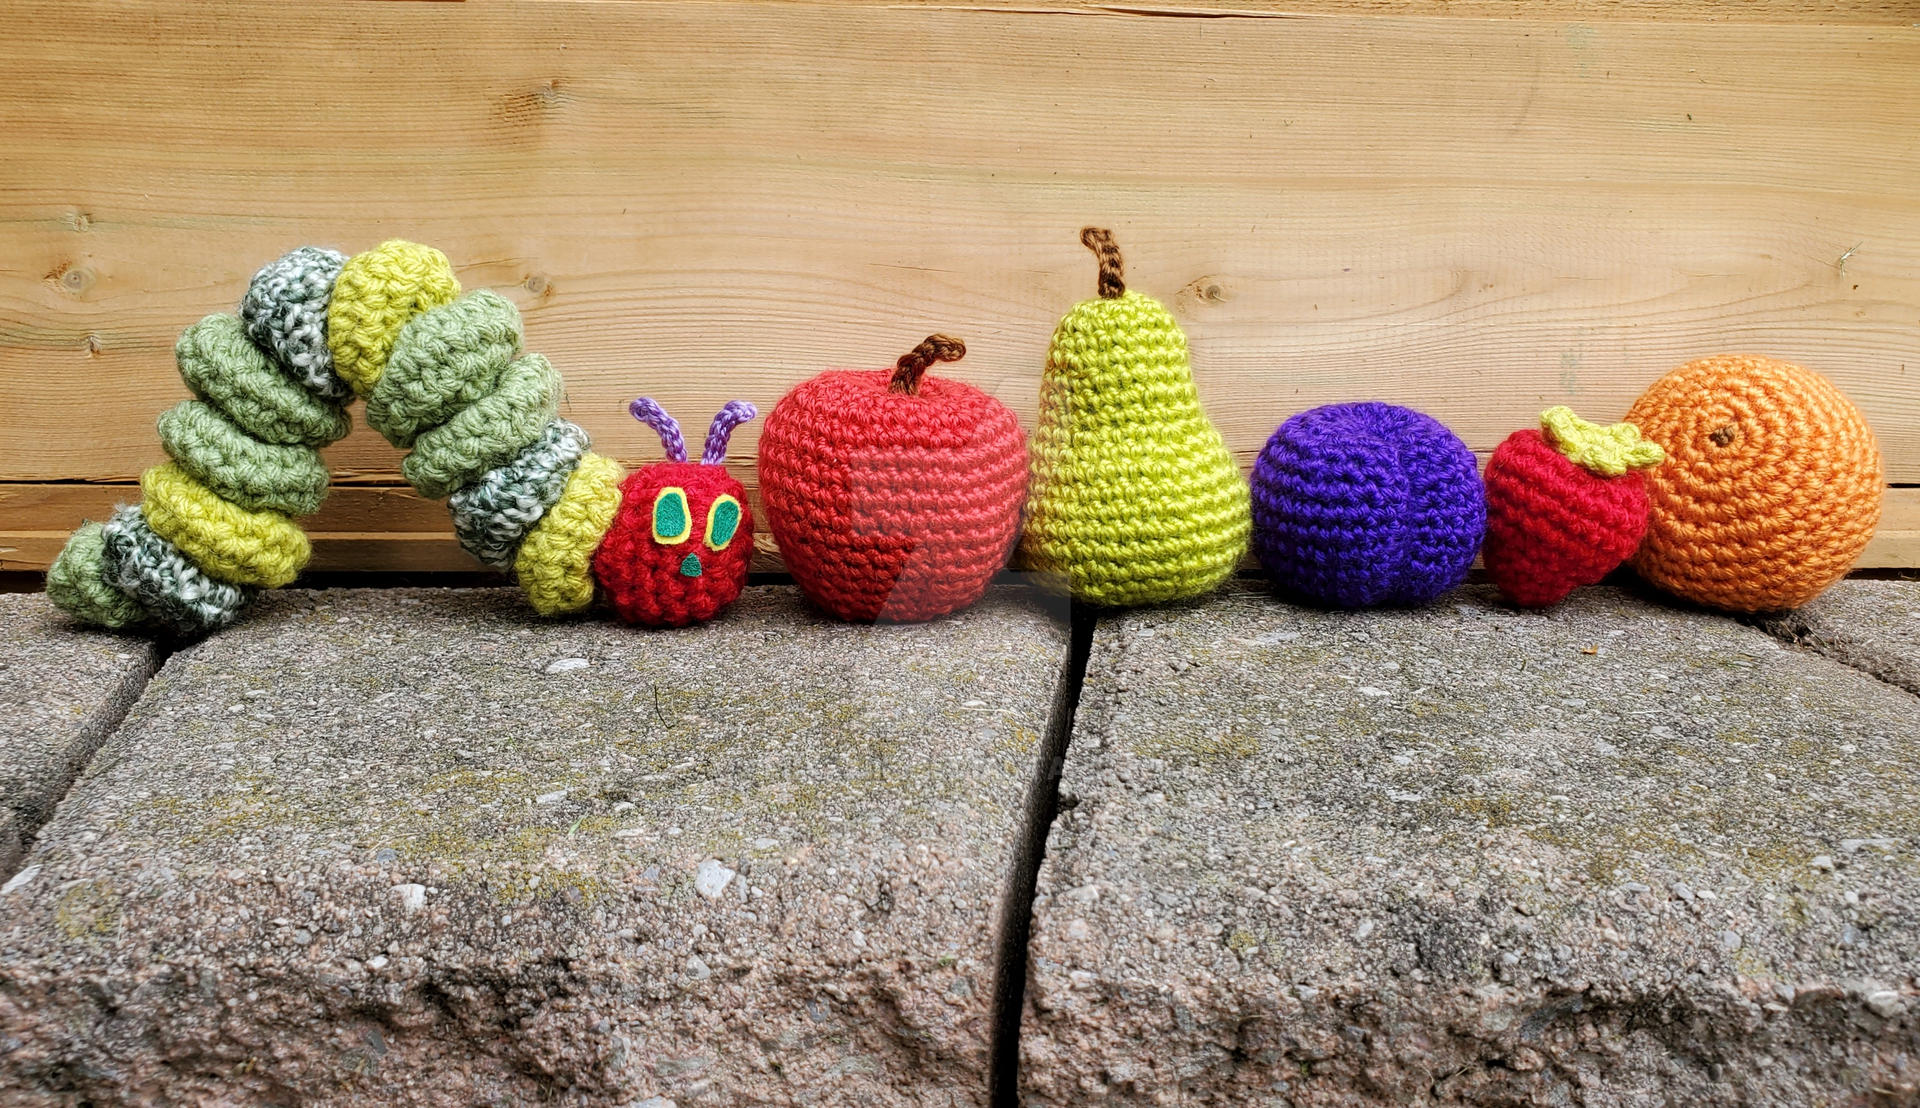 The Very Hungry Caterpillar Crochet Amigurumi